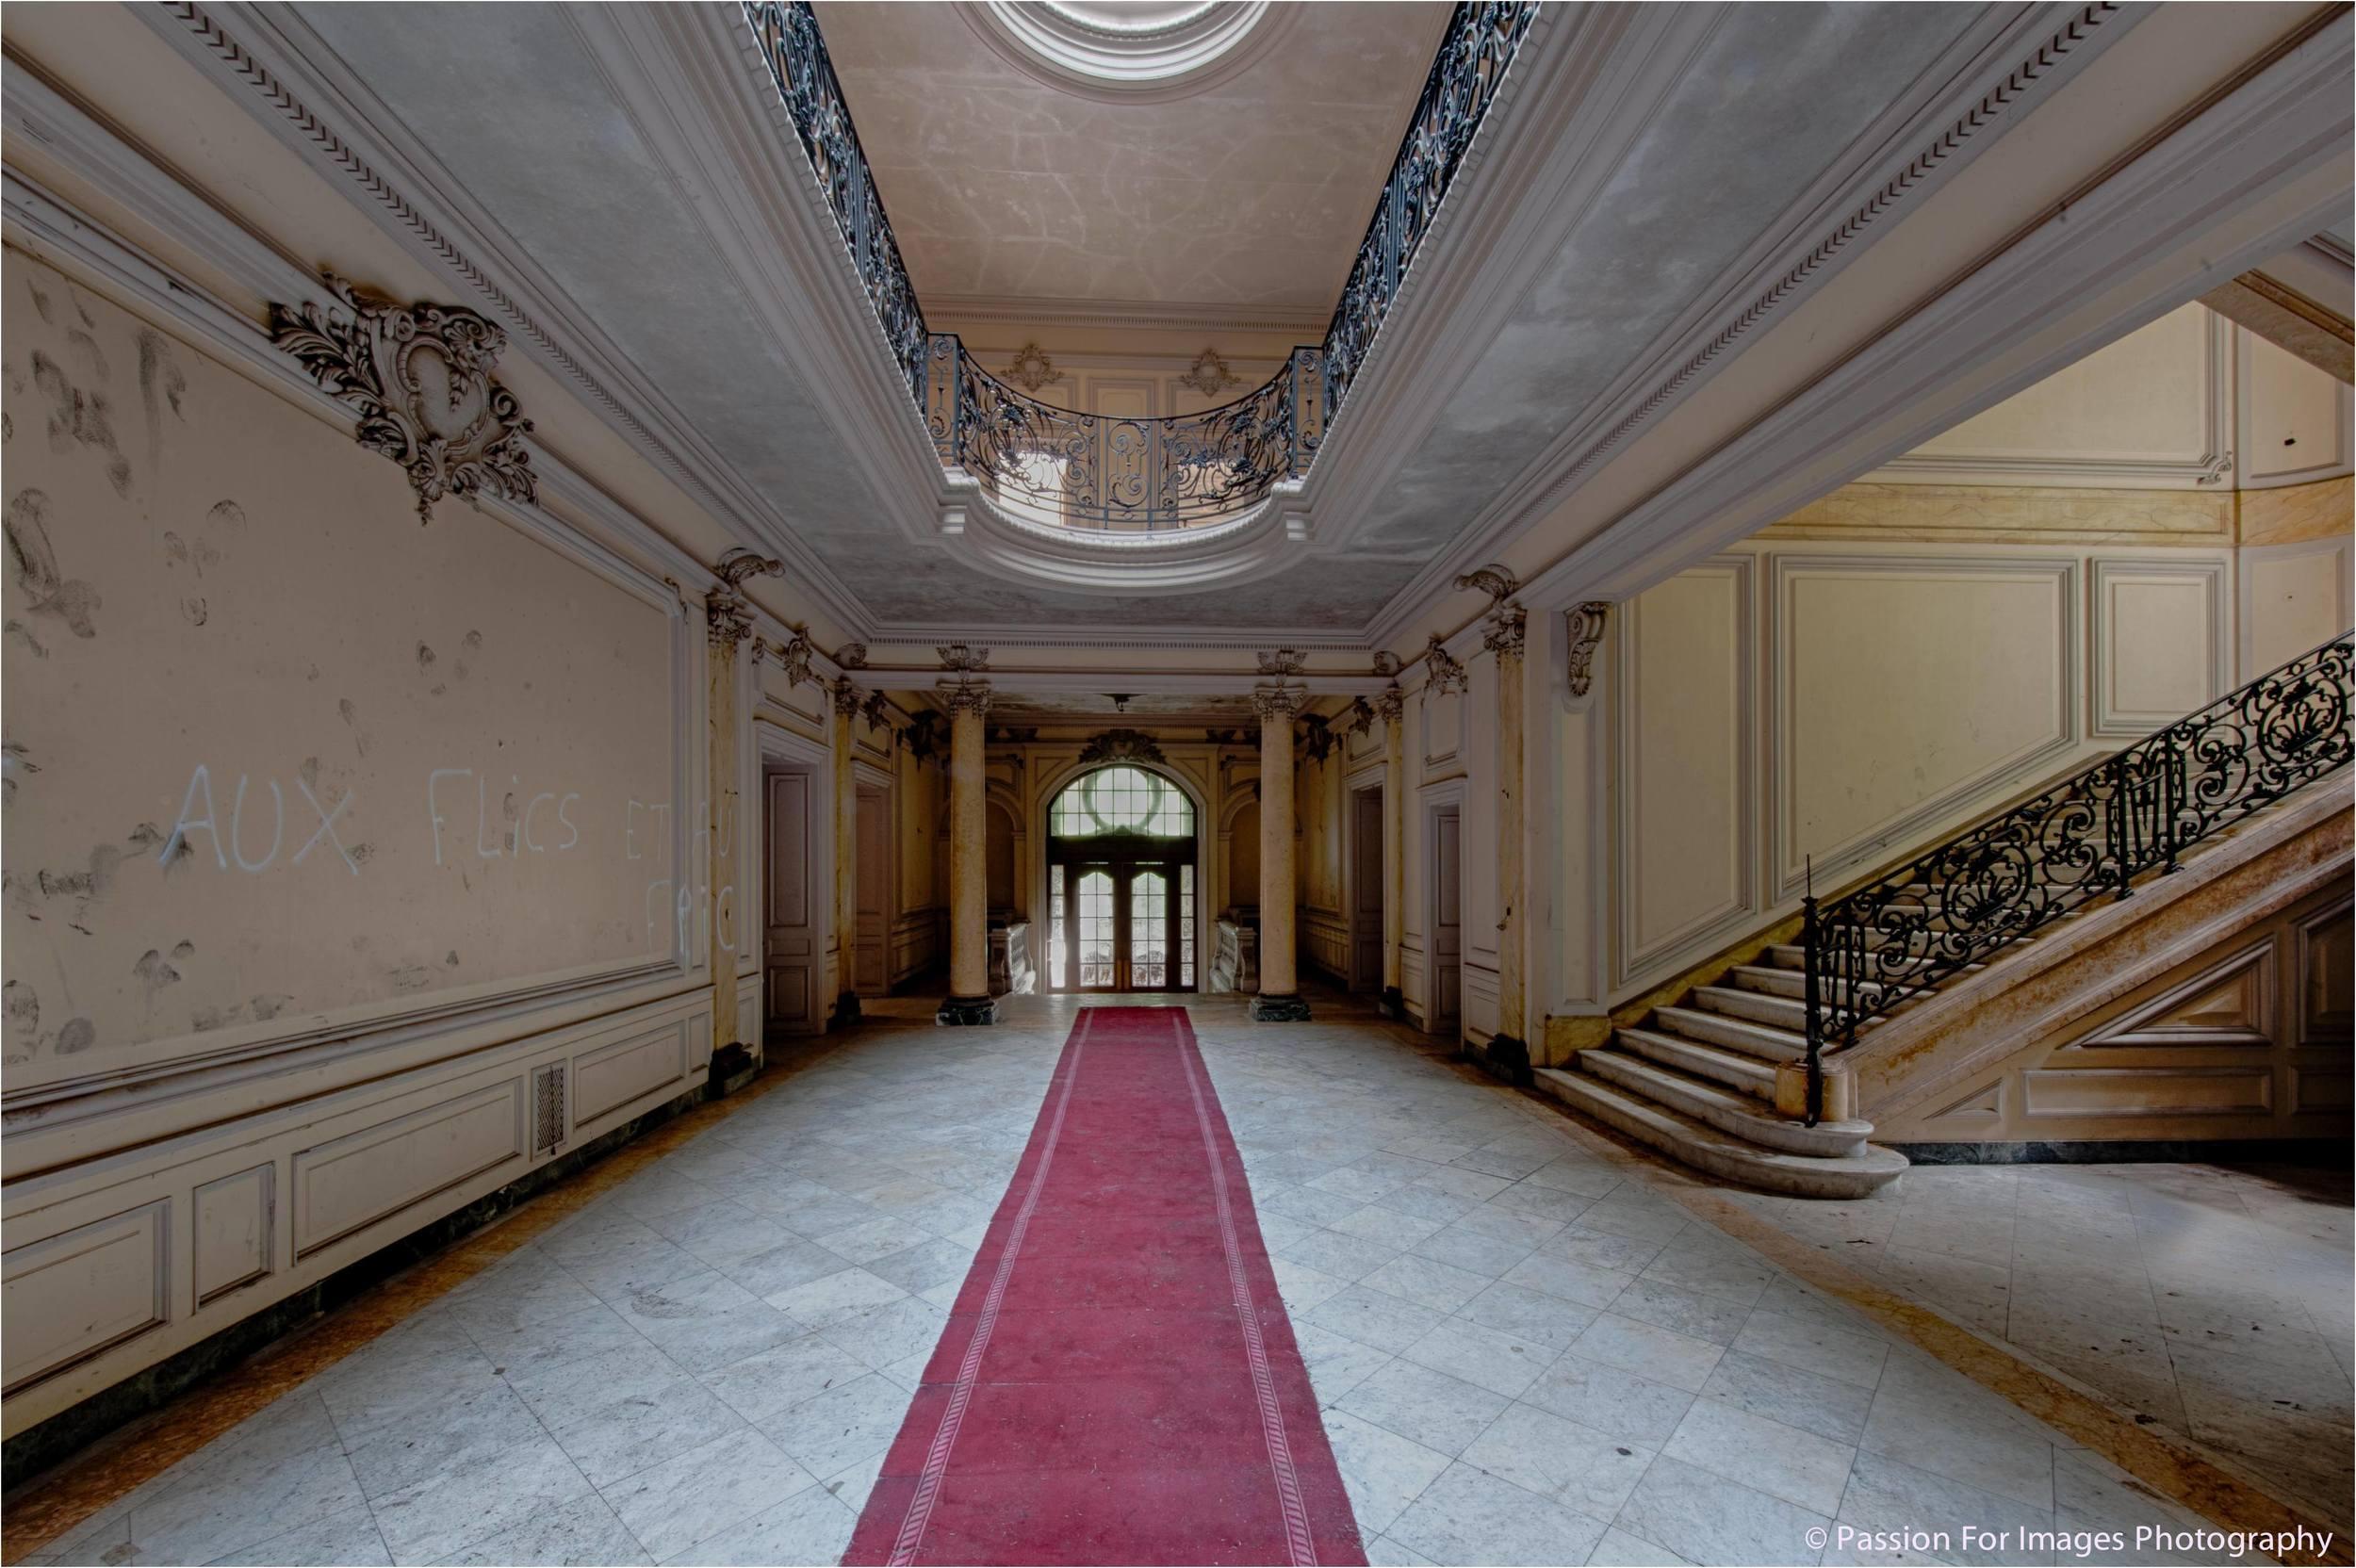 PFI__D7C0687_2014_08_Chateau_Lumiere_HDR.jpg